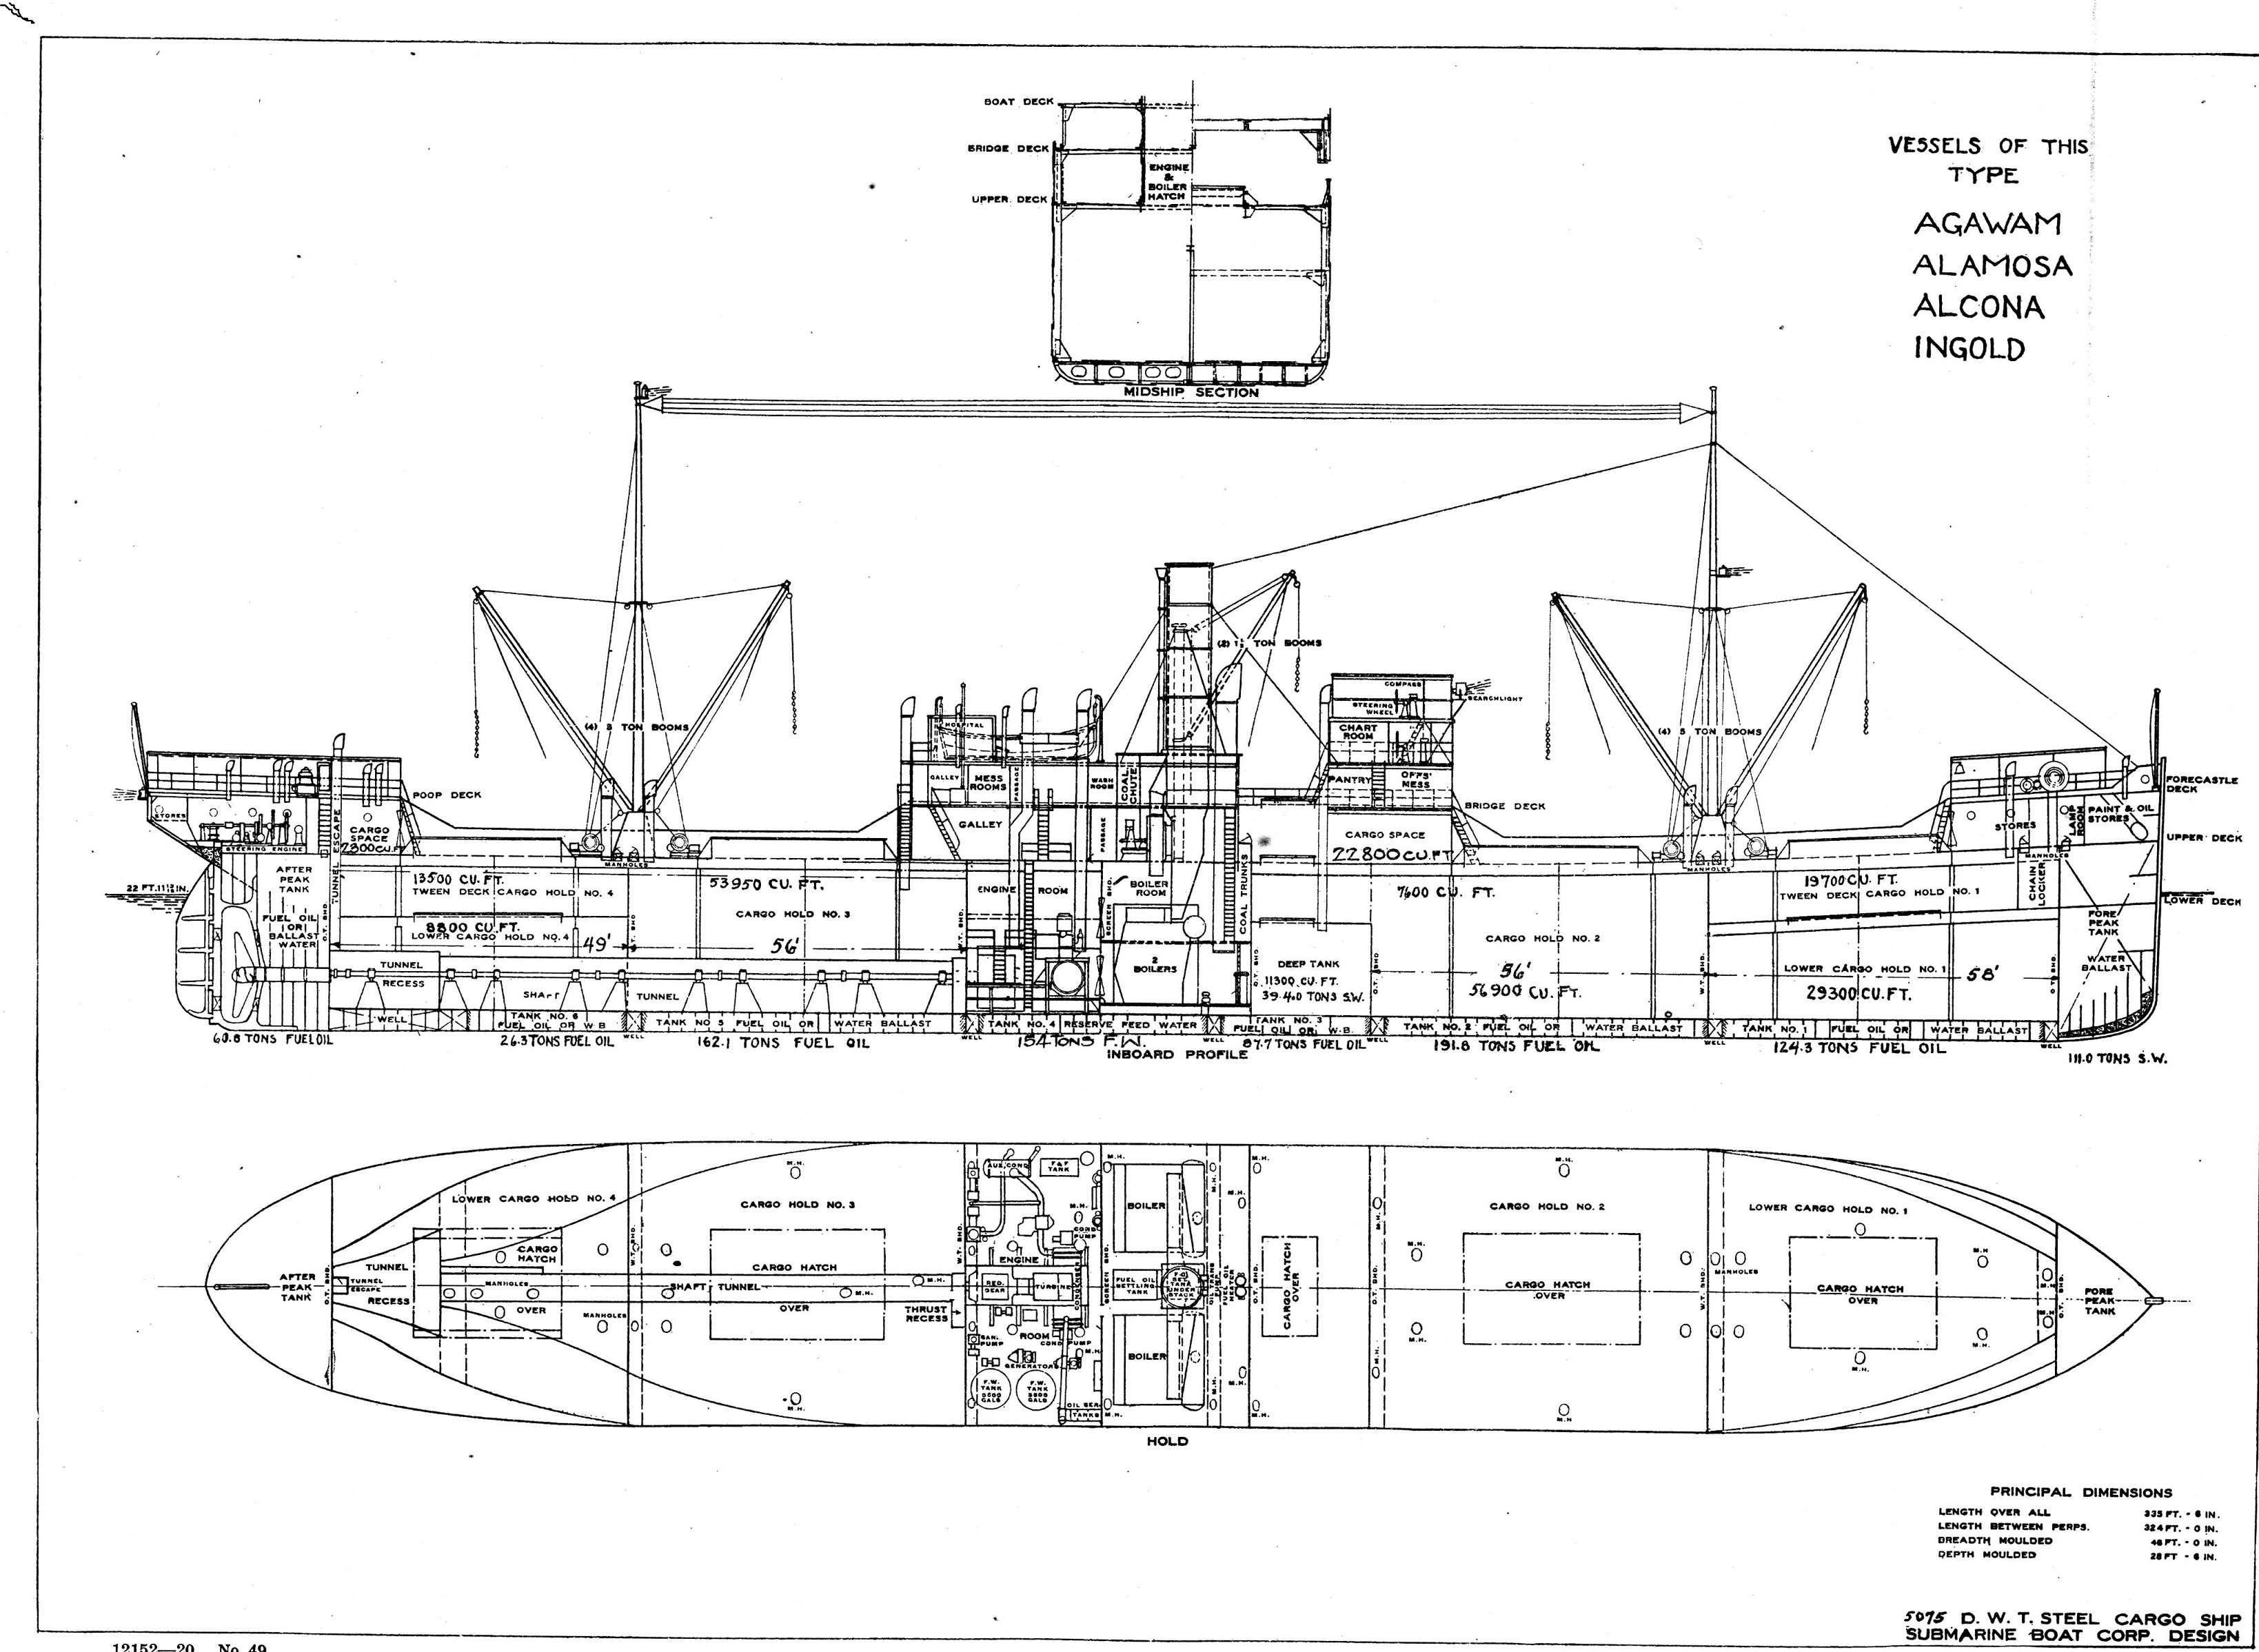 Parts Of A Pirate Ship Diagram Tibia Bone Deck Wiring